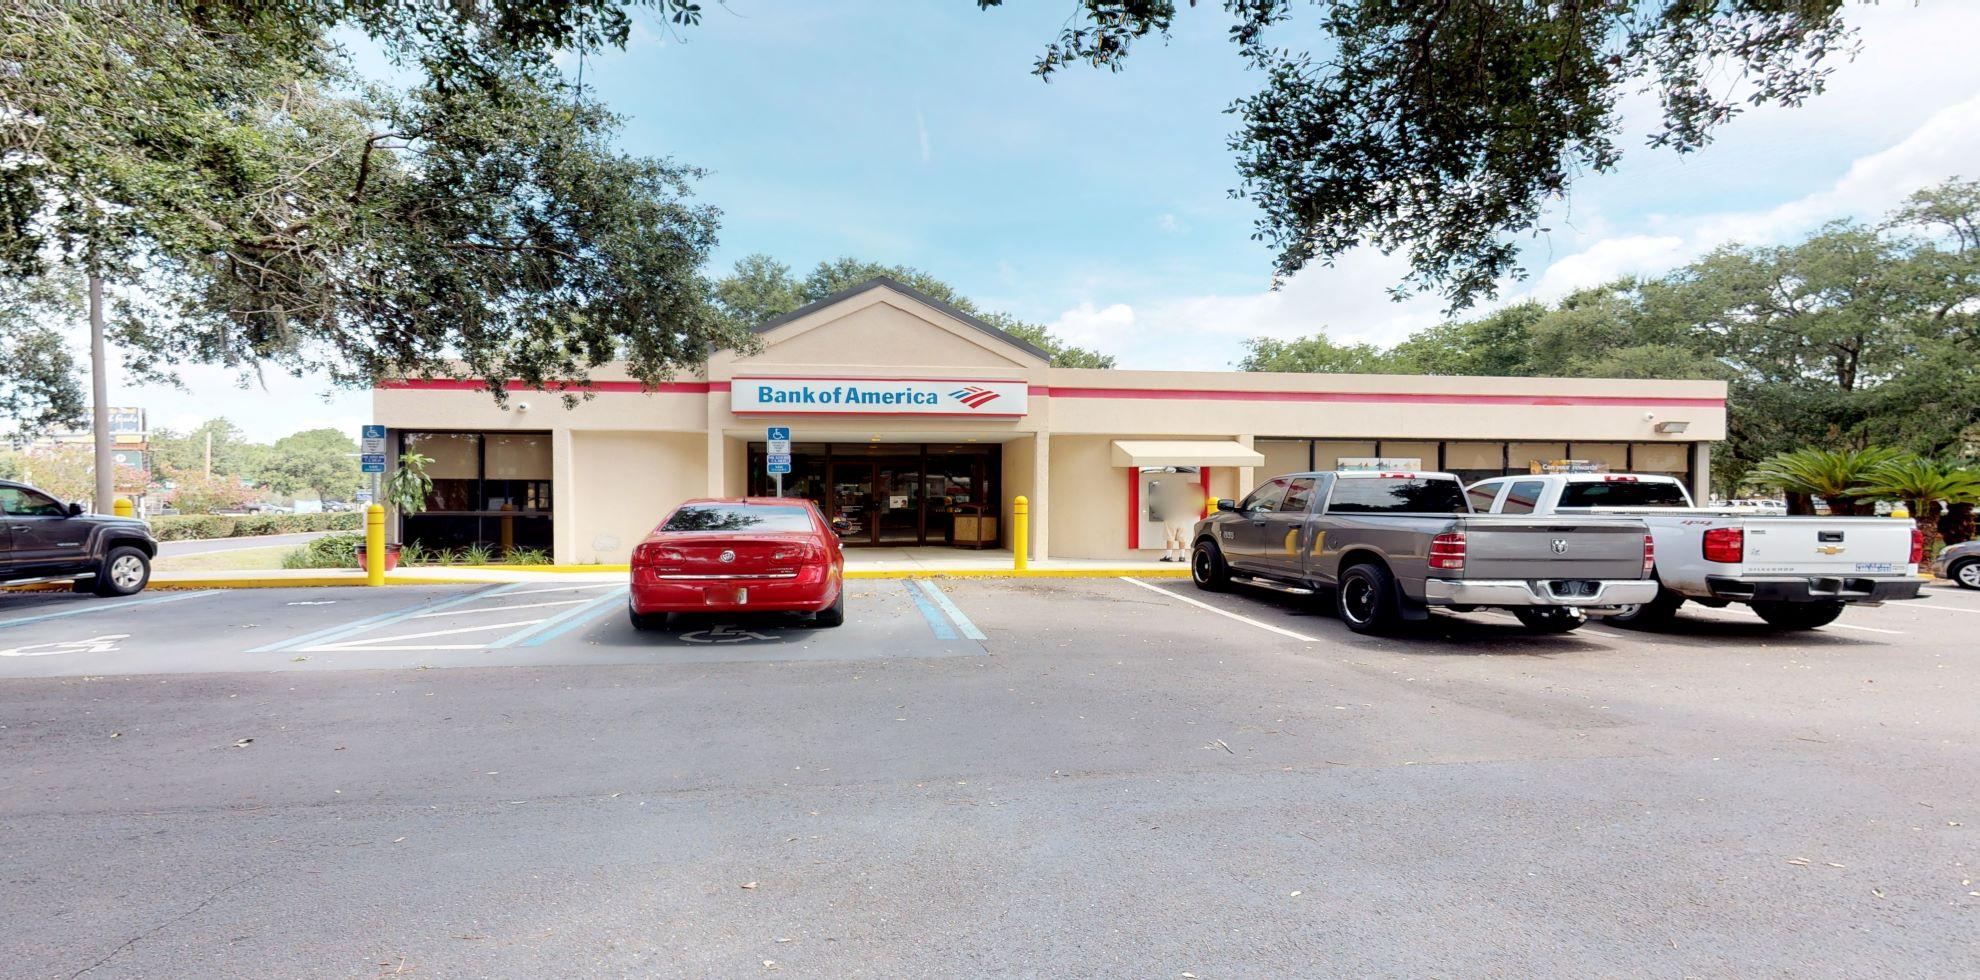 Bank of America financial center with drive-thru ATM and teller   1822 S 8th St, Fernandina Beach, FL 32034